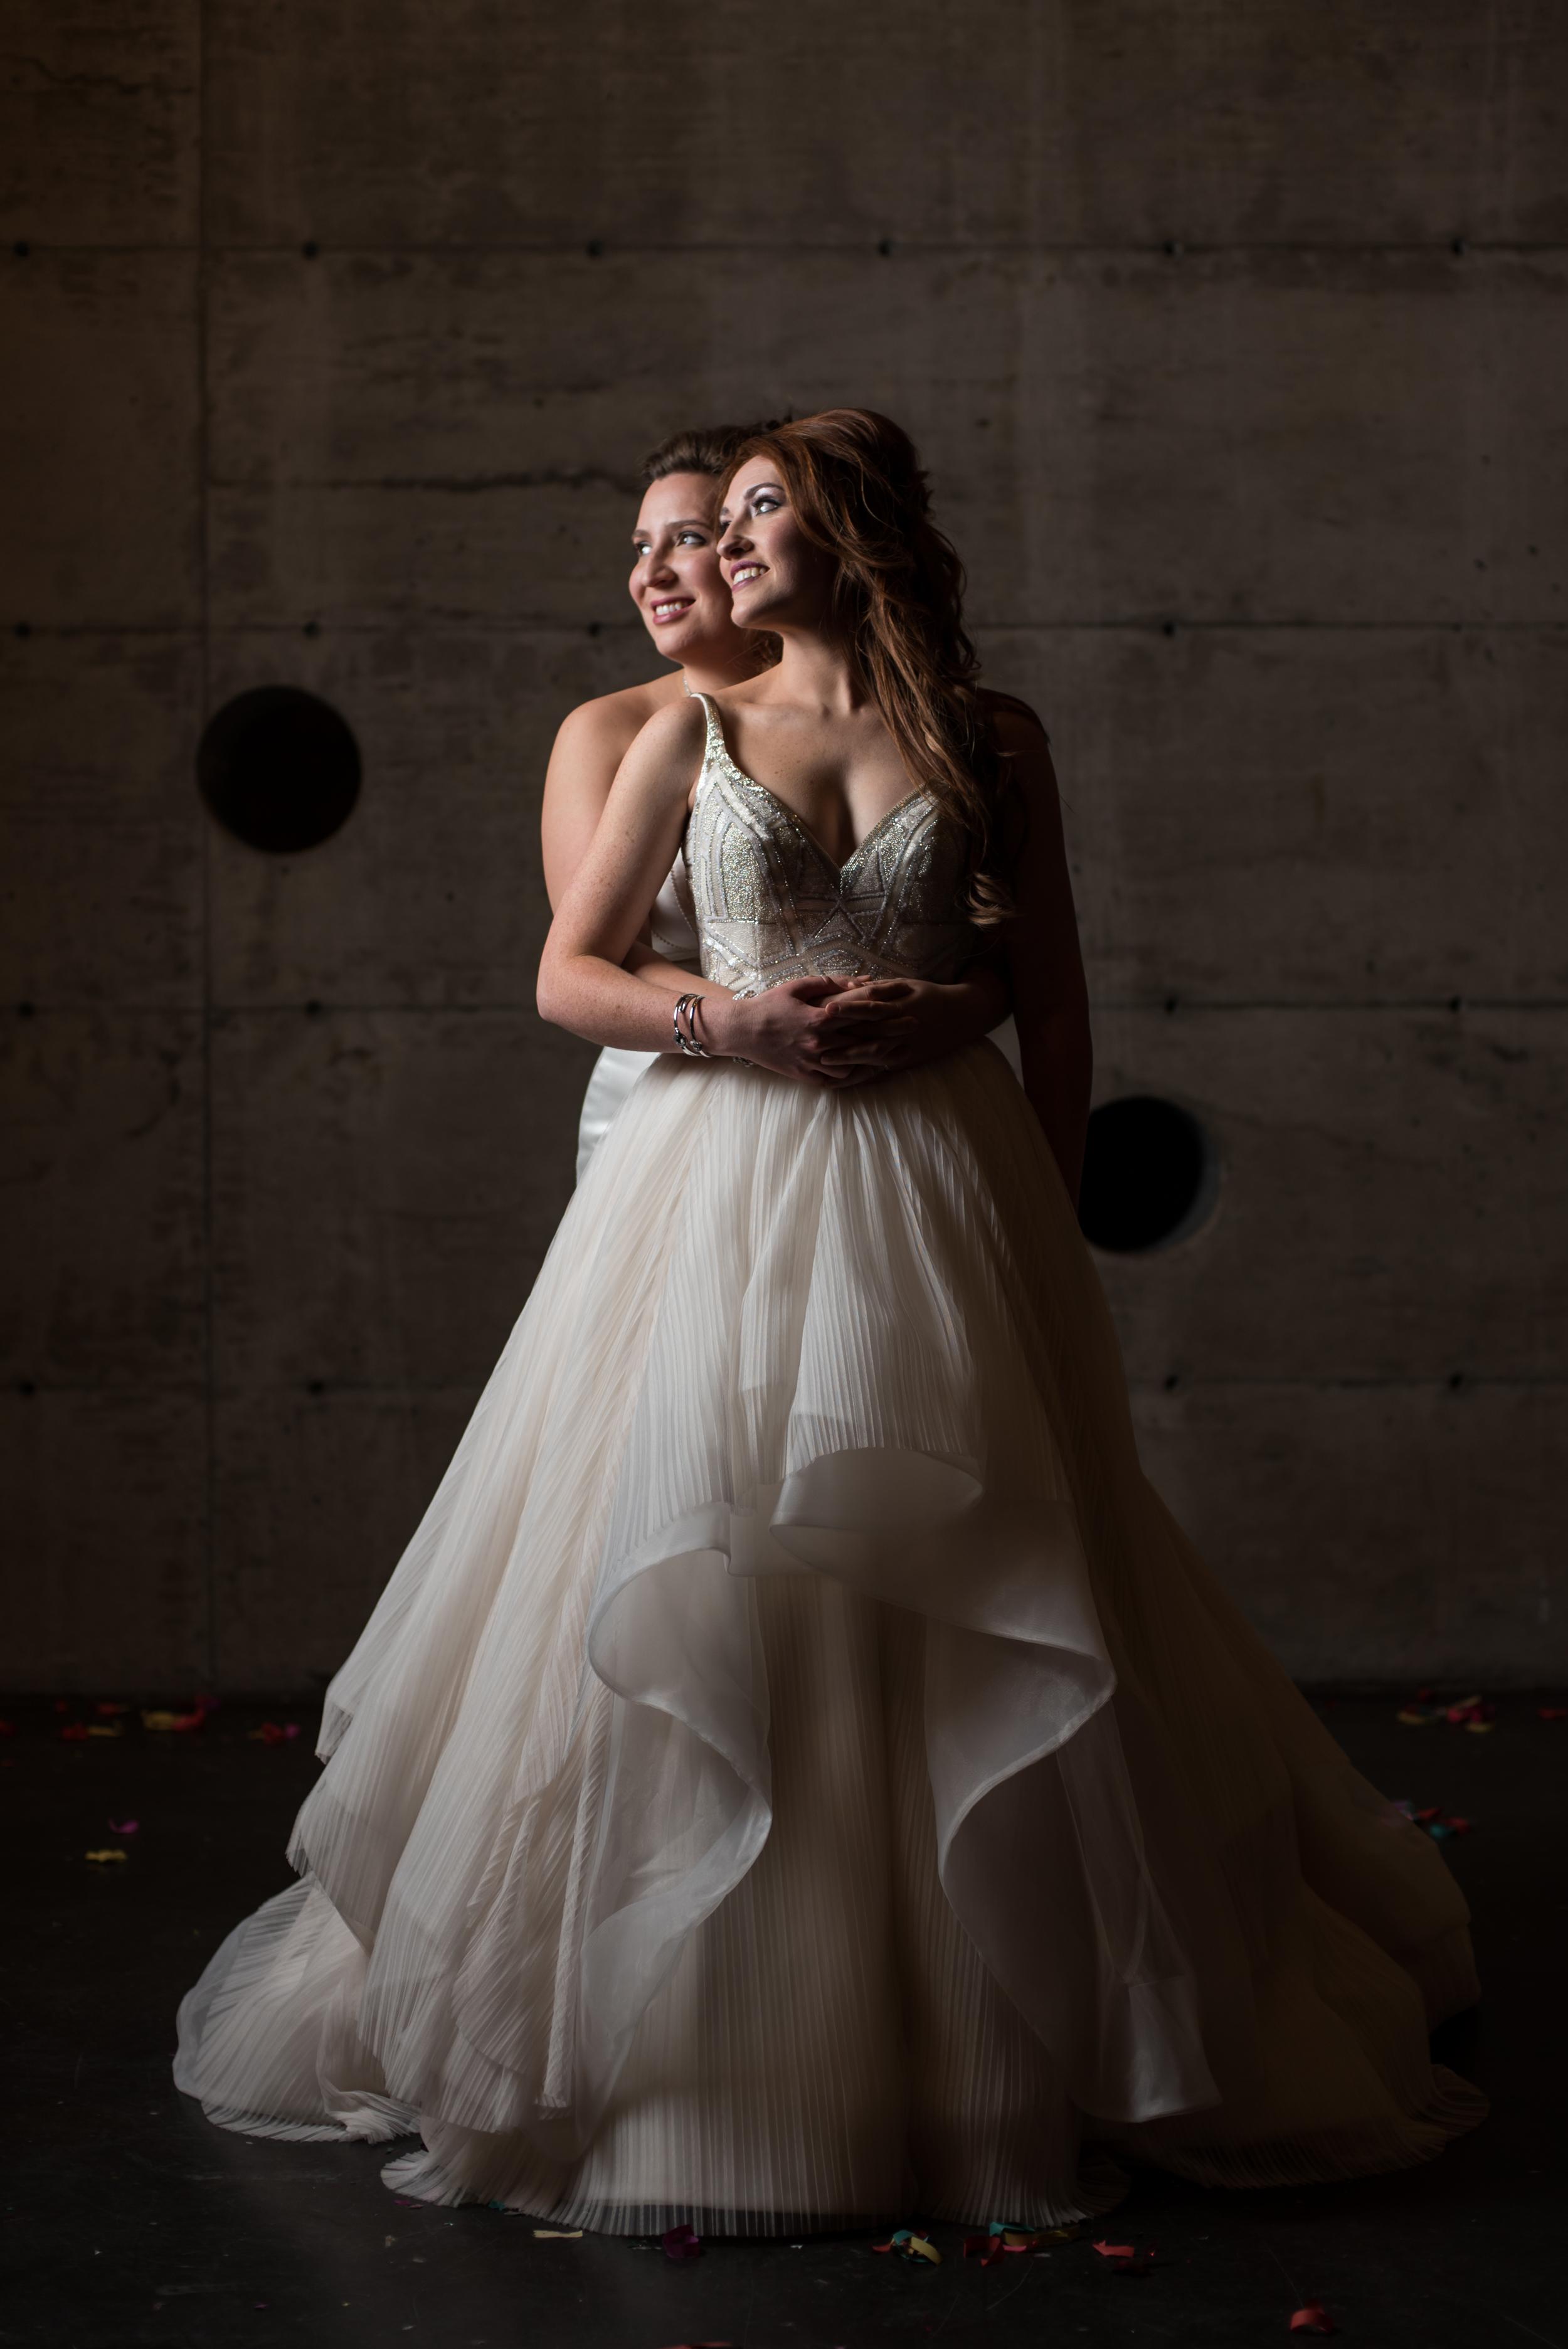 A formal portrait of the brides